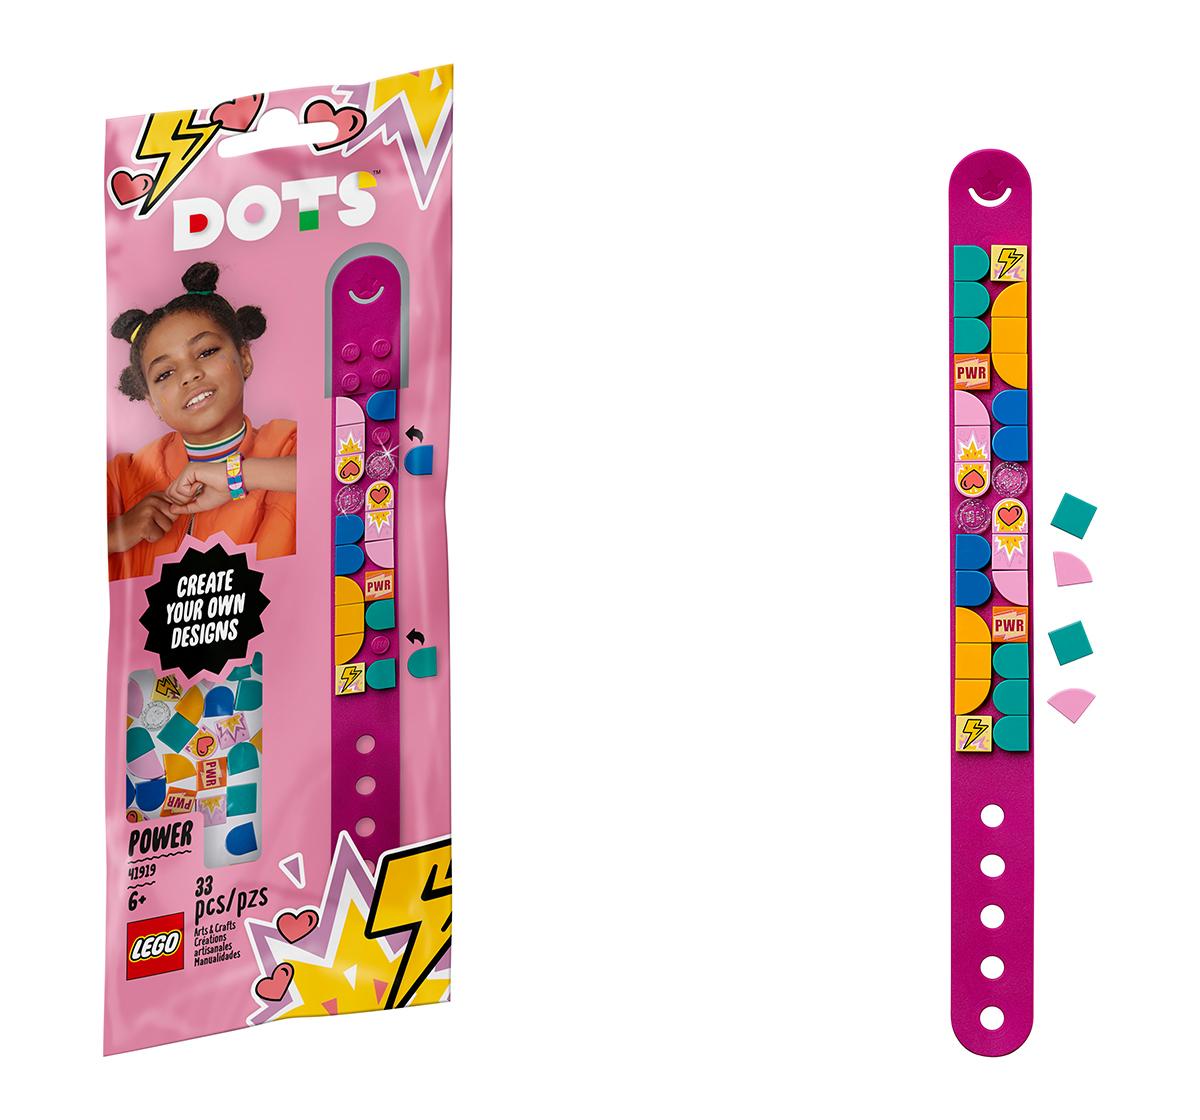 LEGO | LEGO 41919 Power Bracelet Lego Blocks for Girls age 6Y+